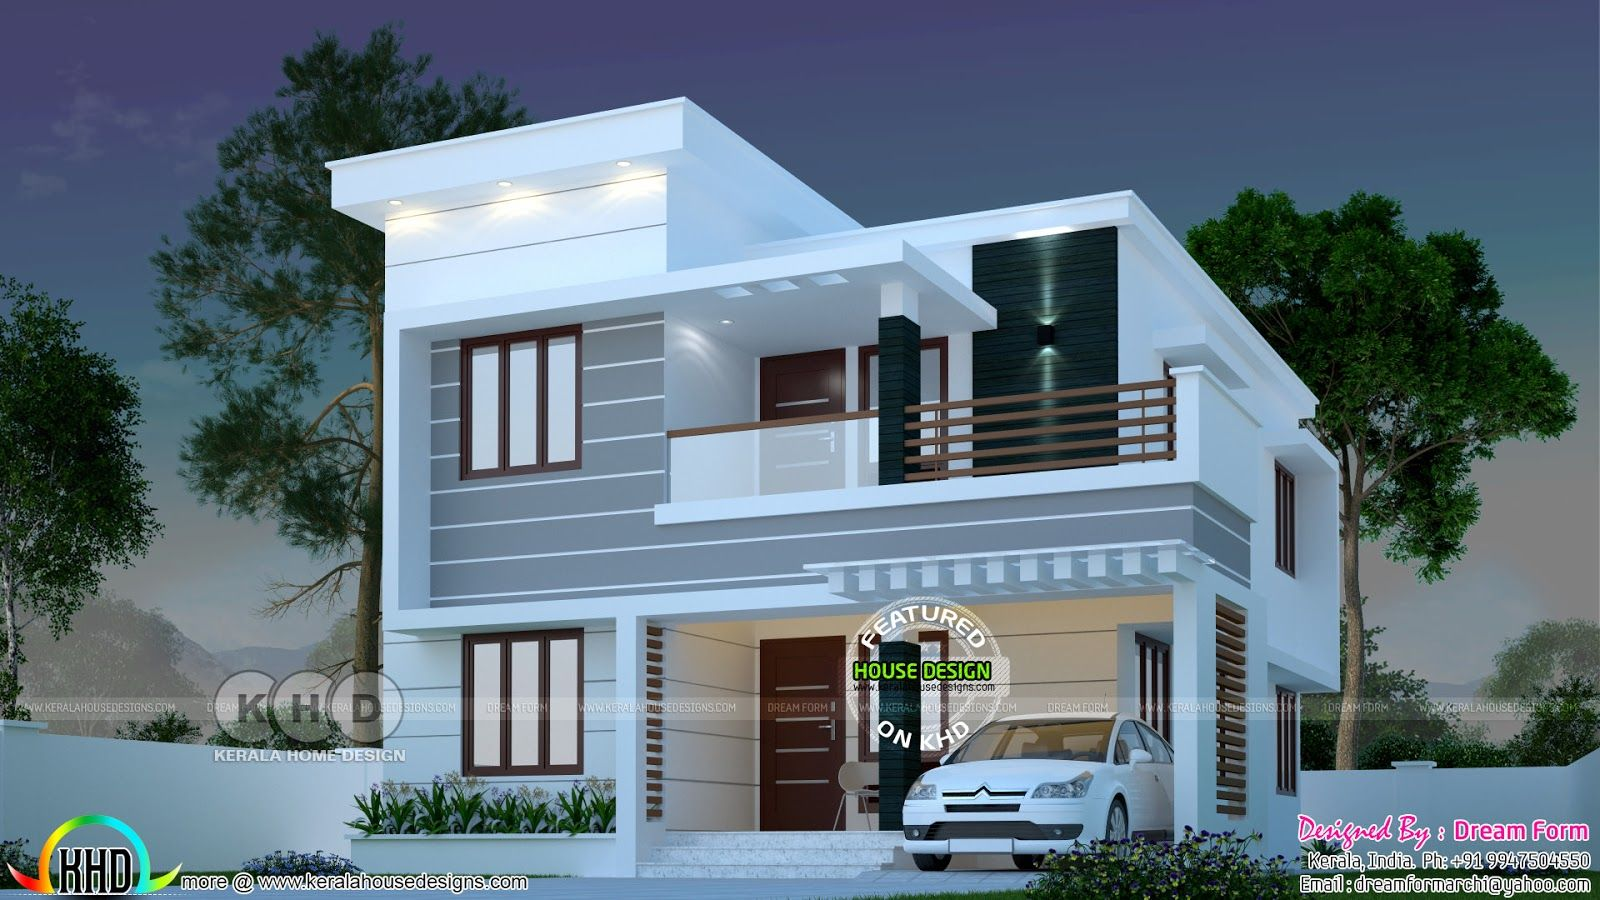 Pin By Keki On House Duplex House Design Kerala House Design